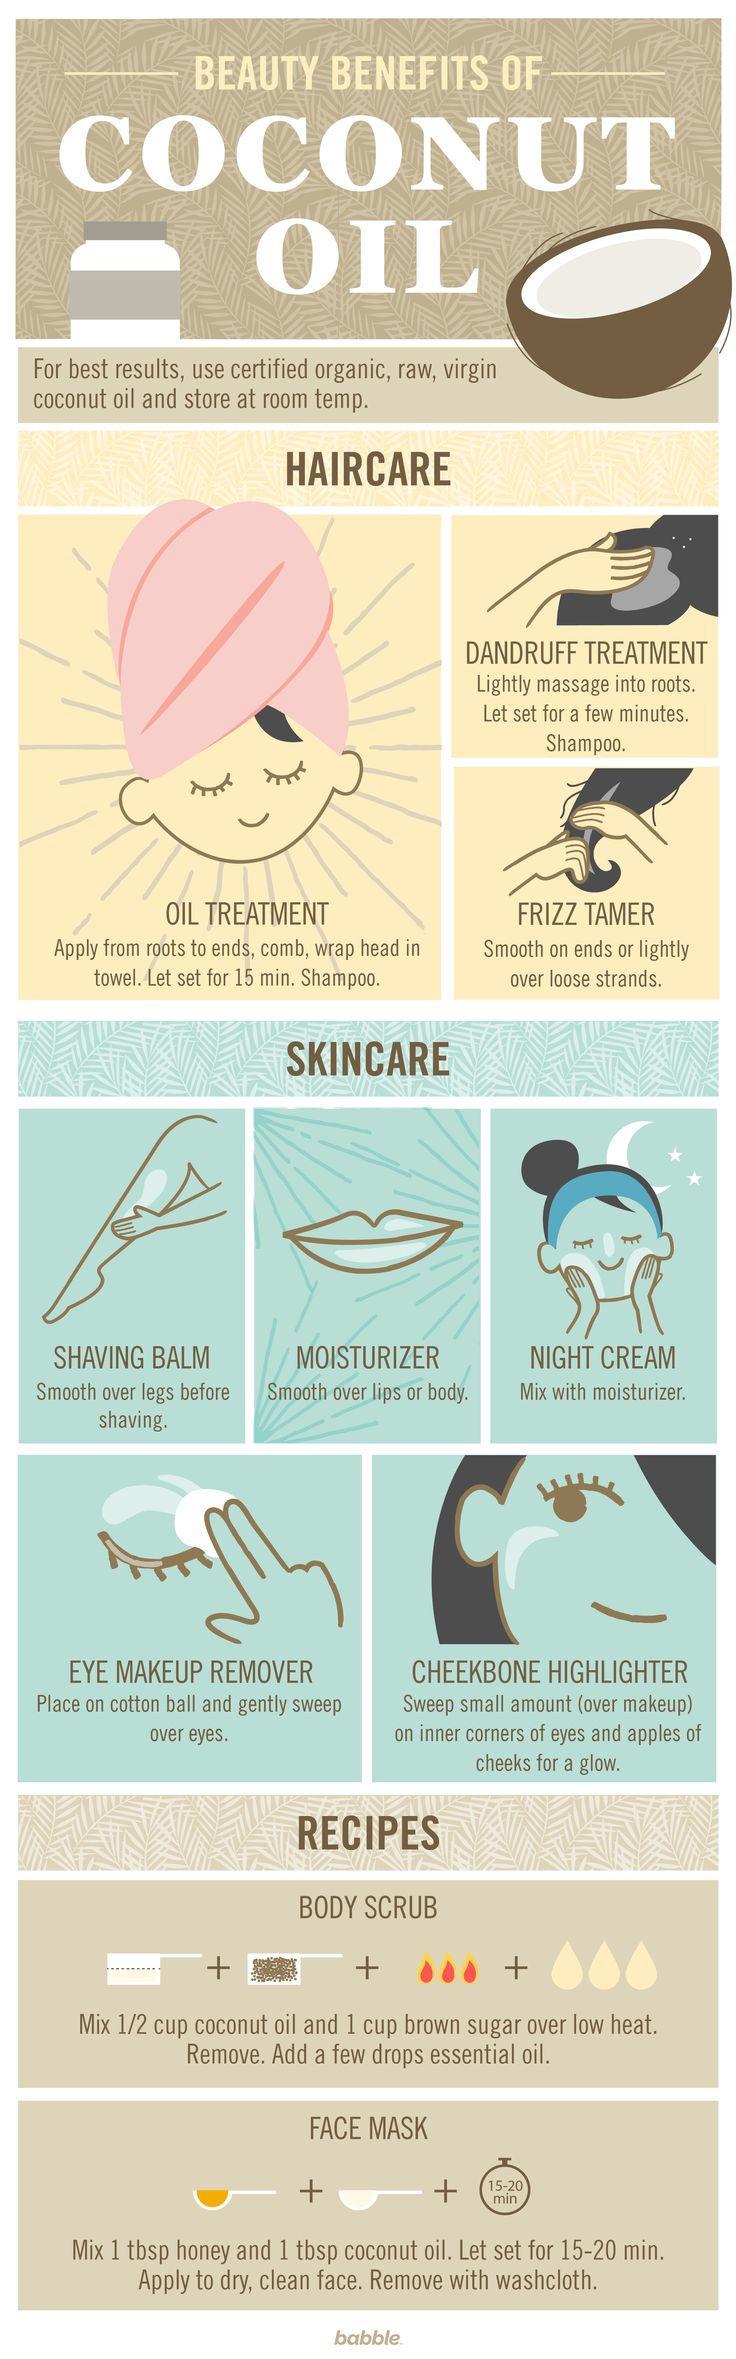 Wedding - 10 Beauty Benefits Of Coconut Oil